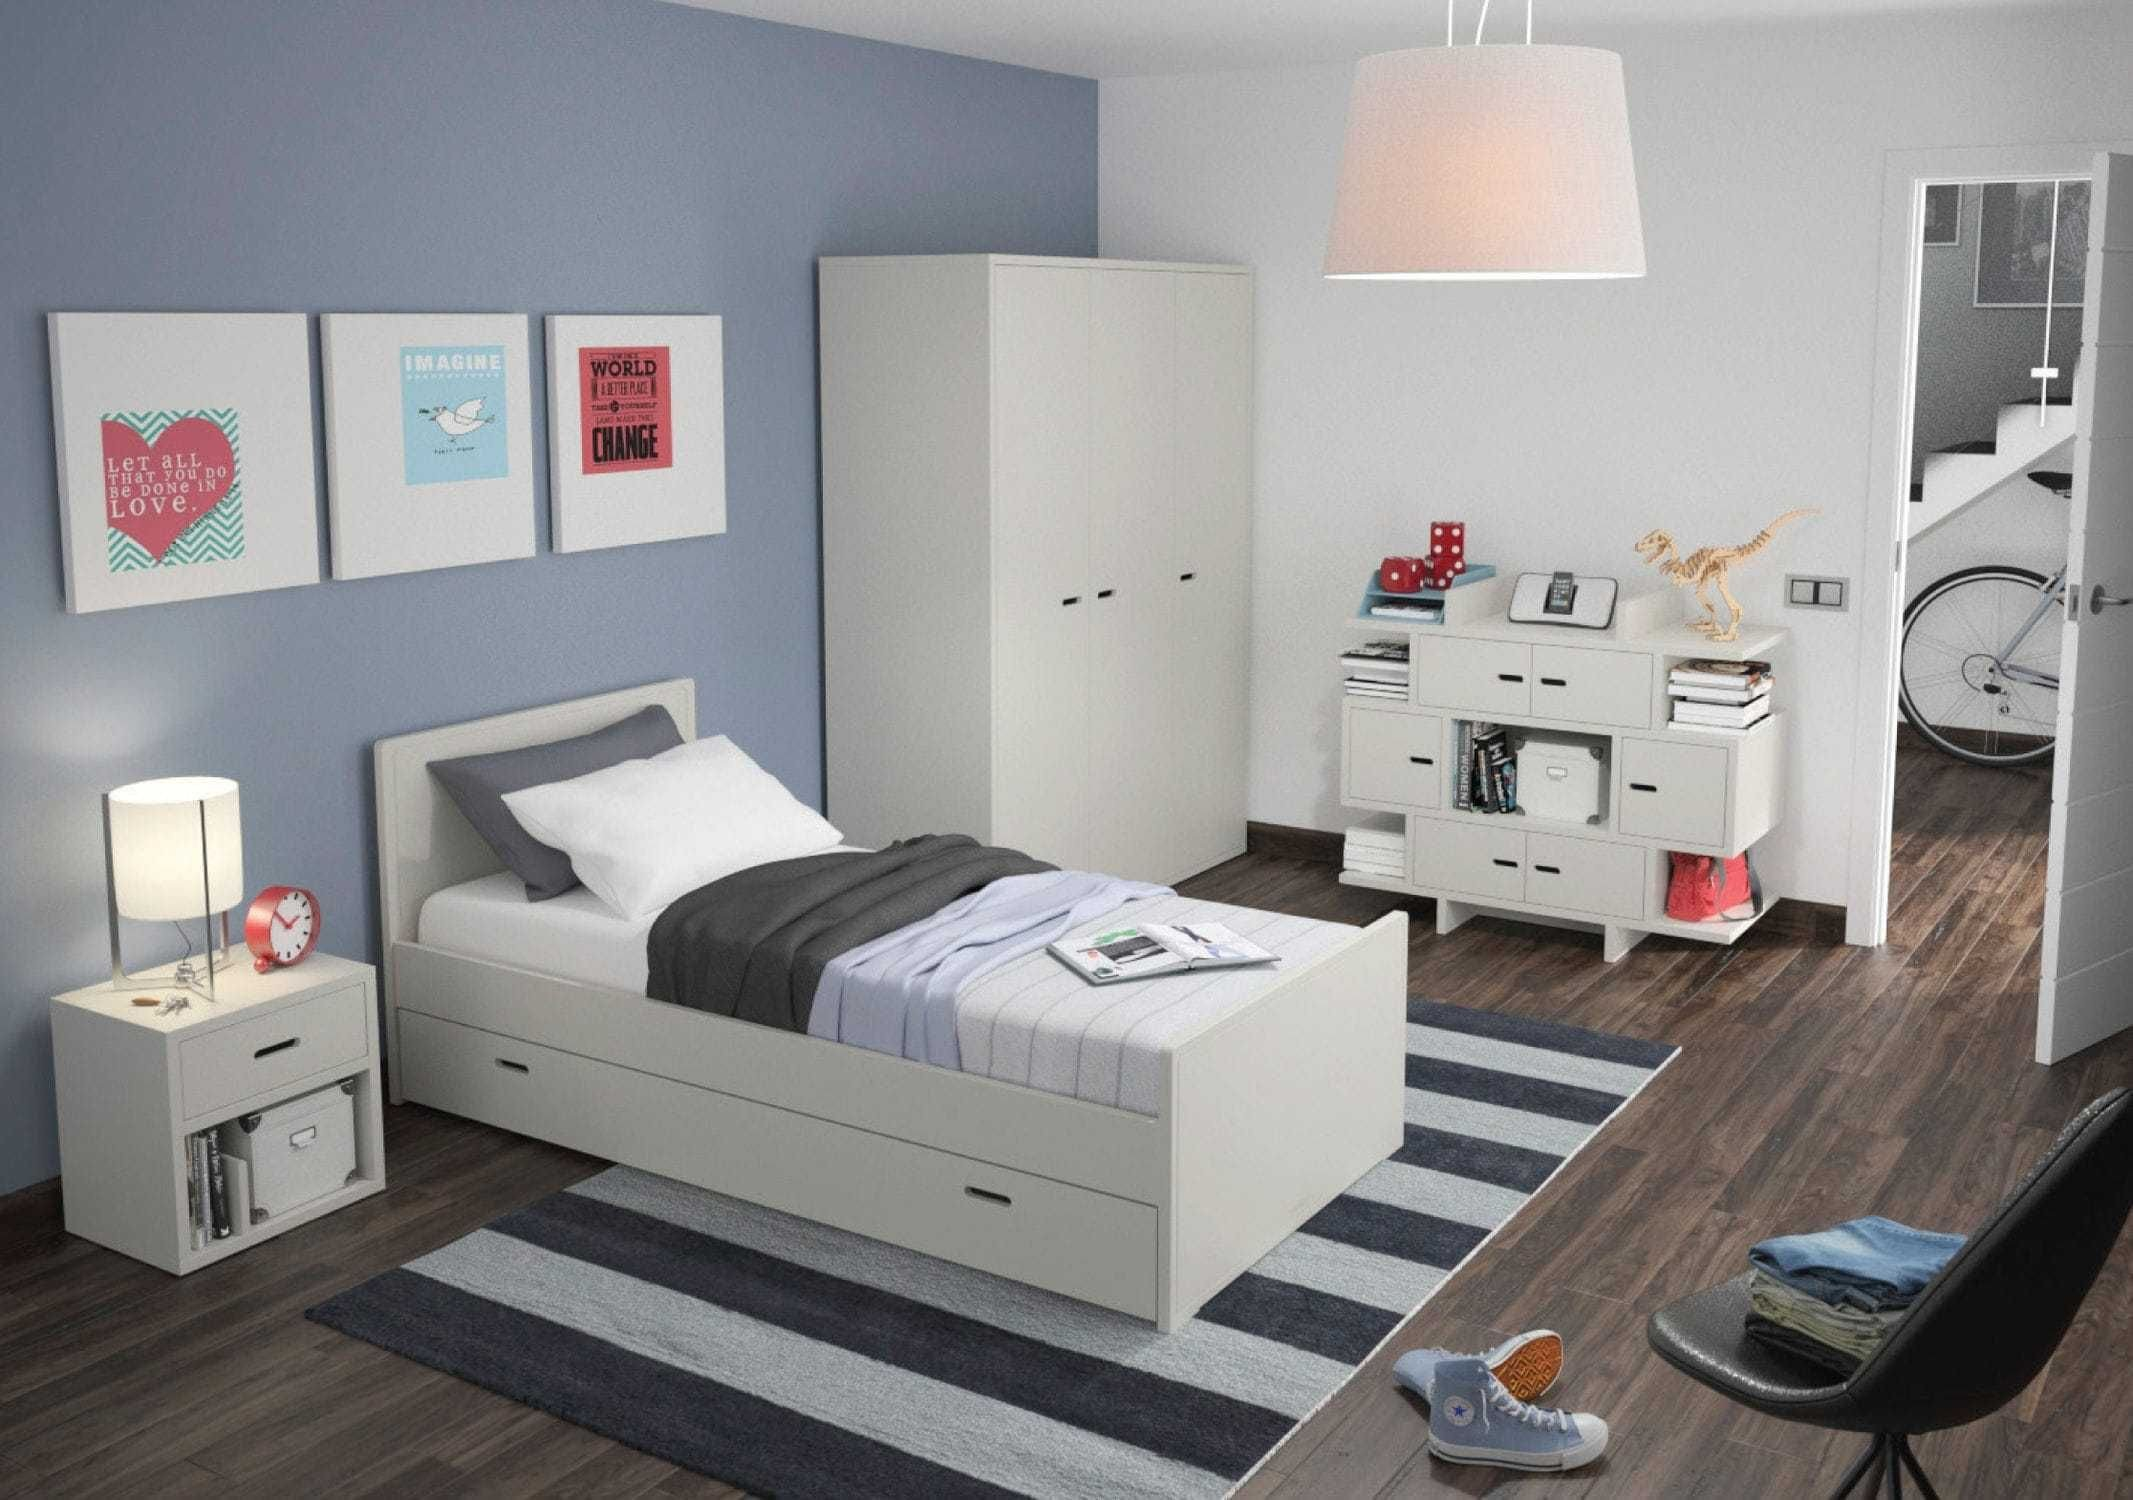 Ashley Furniture Kids Bedroom Luxury 15 Lovely Childrens Bedroom Furniture Sets Ideas